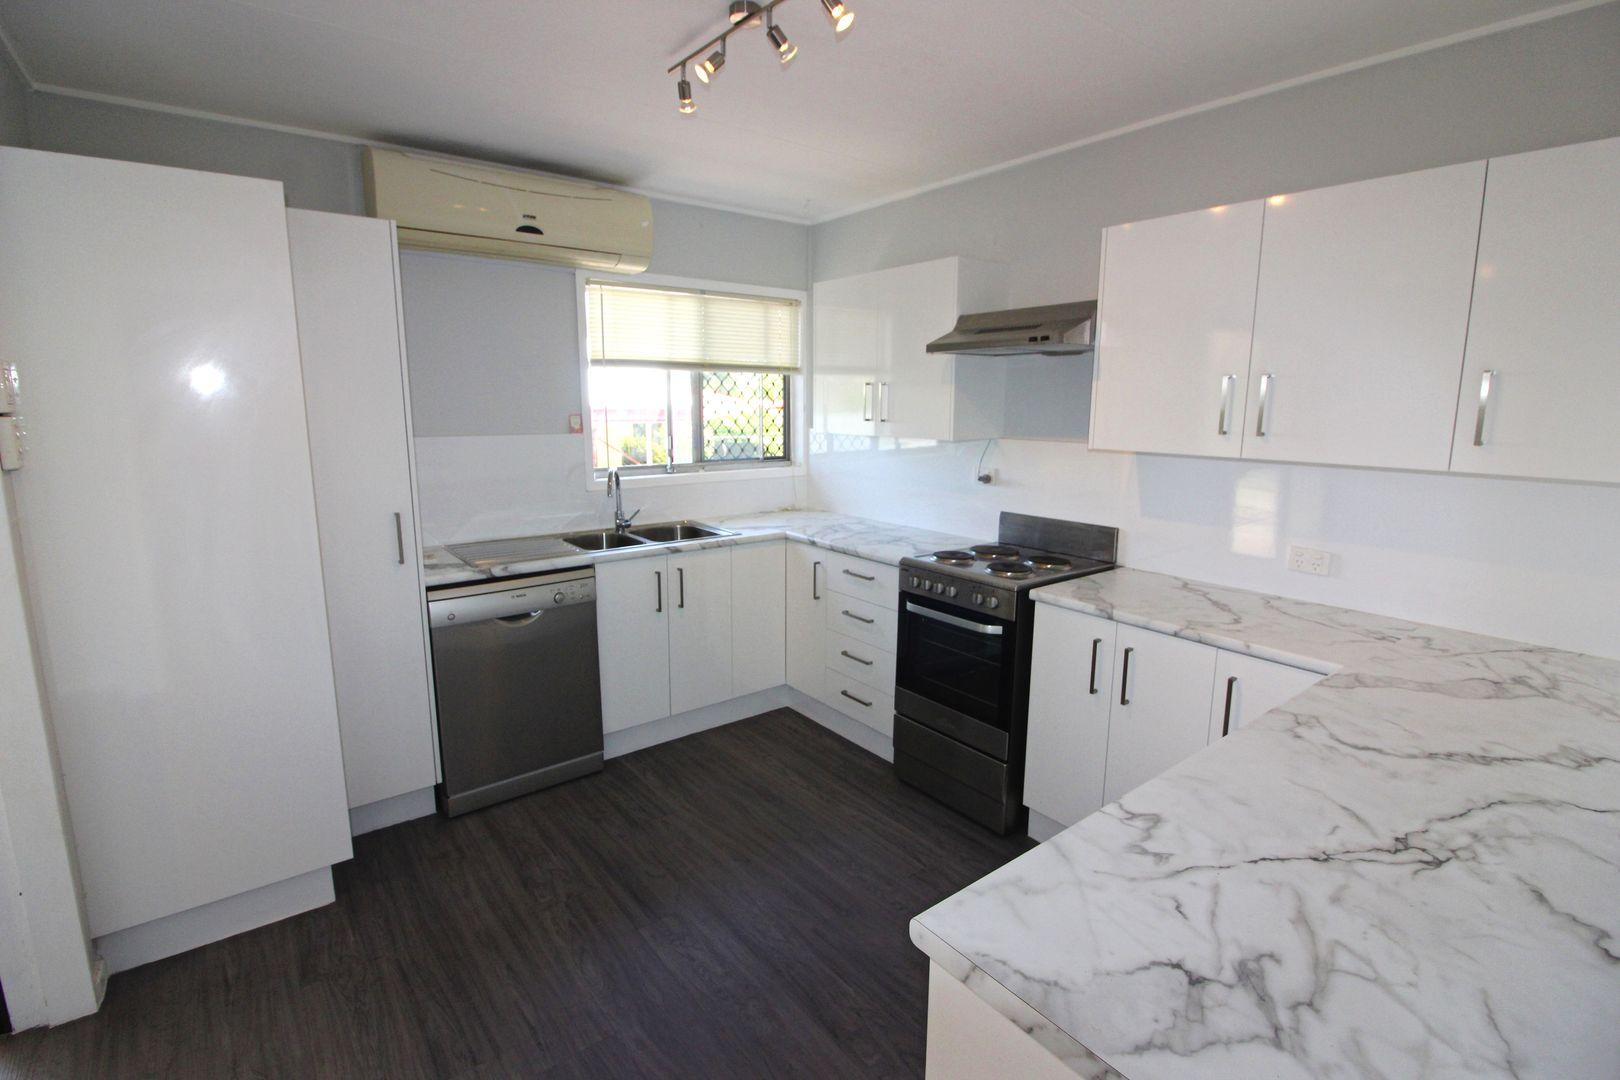 81 Brett Ave, Mount Isa QLD 4825, Image 0